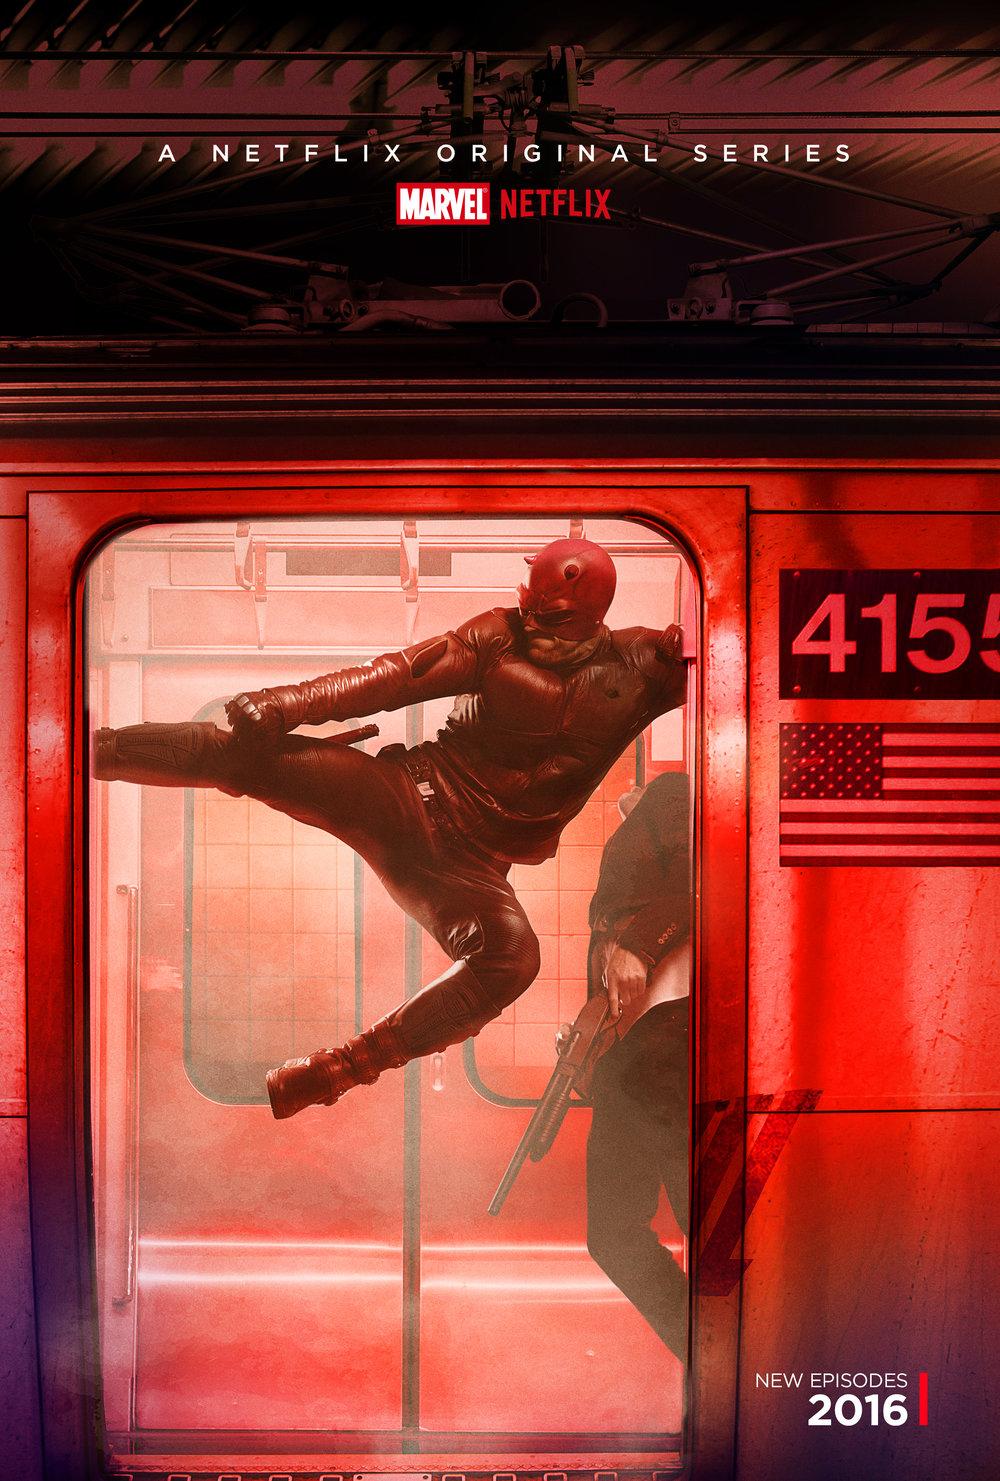 Daredevil Character Banner - Netflix